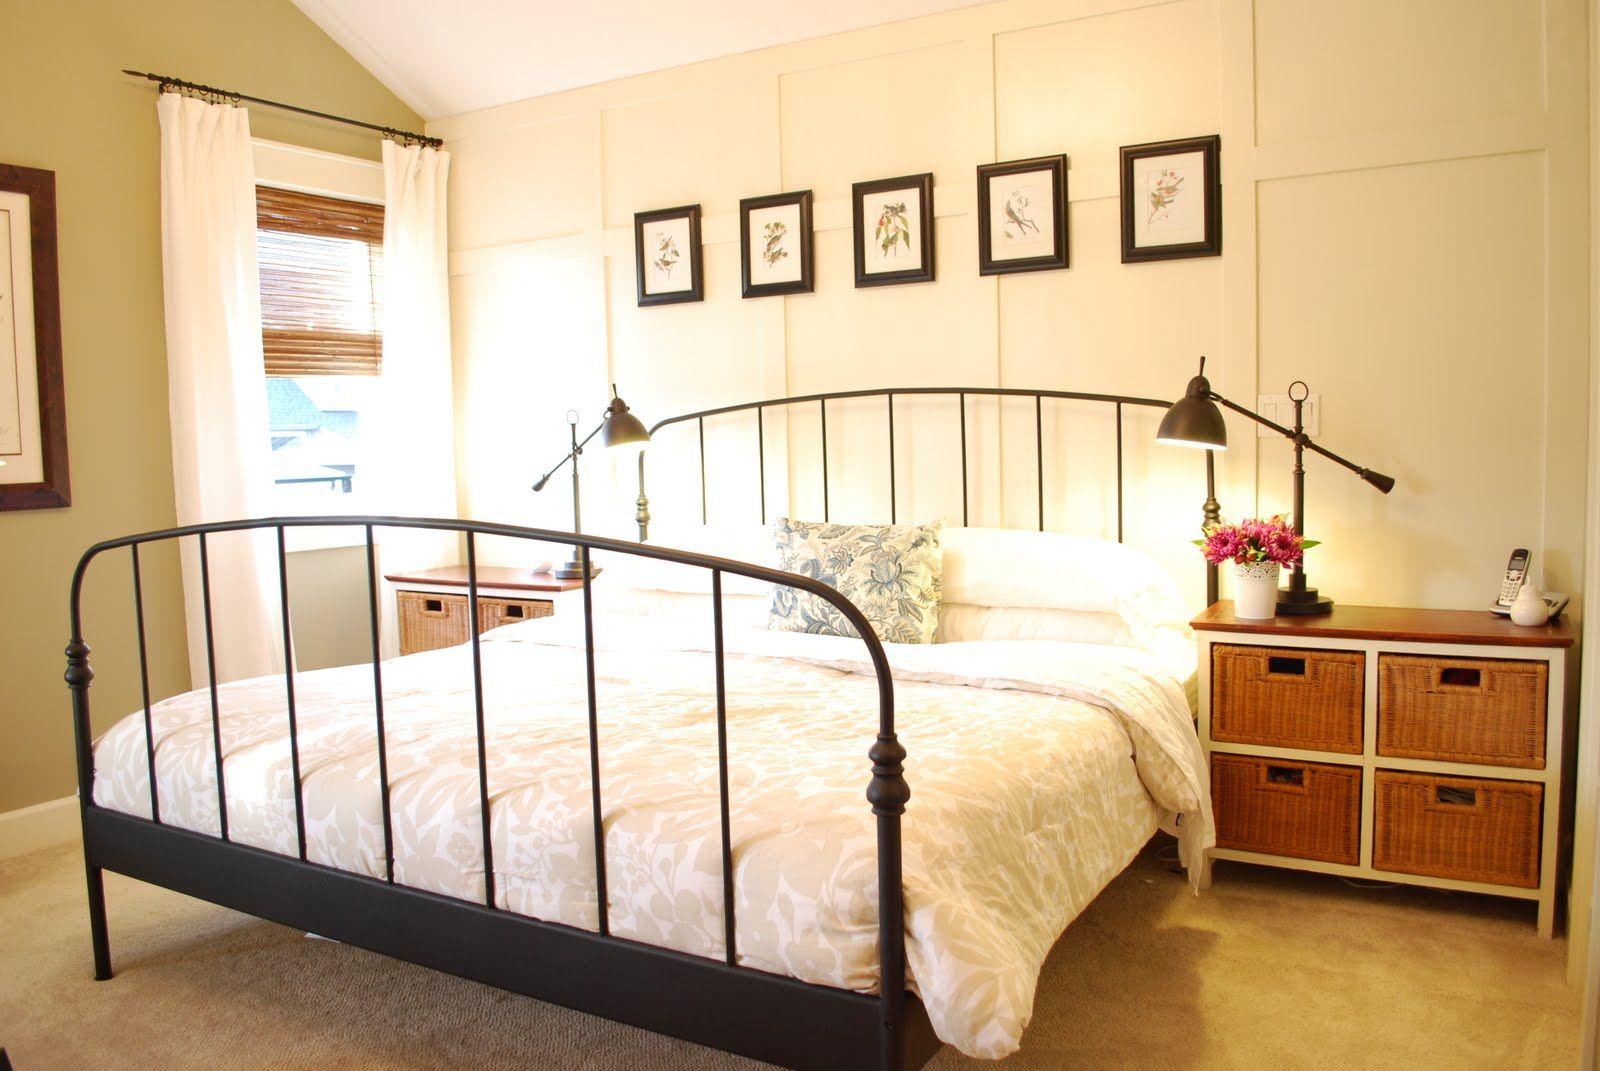 Ikea Lillesand Bed Master Bedroom Redo Master Bedroom Inspiration Home